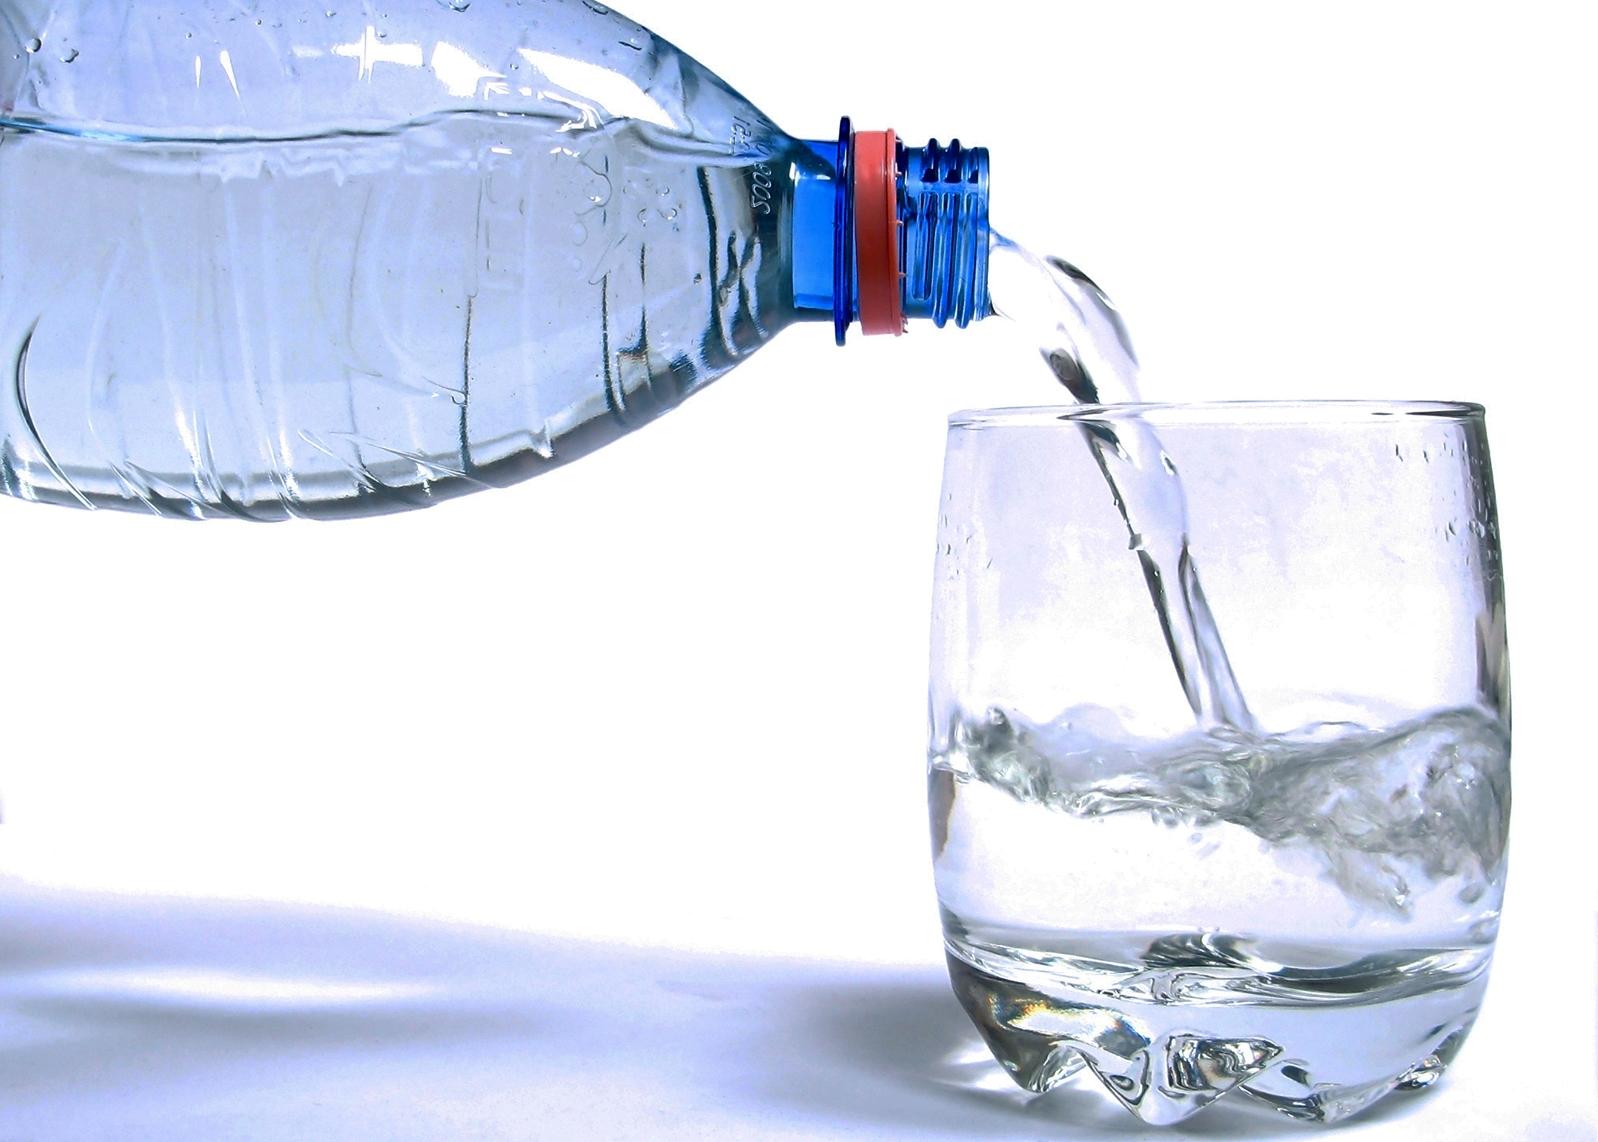 (source: bottledwatermatters.org)